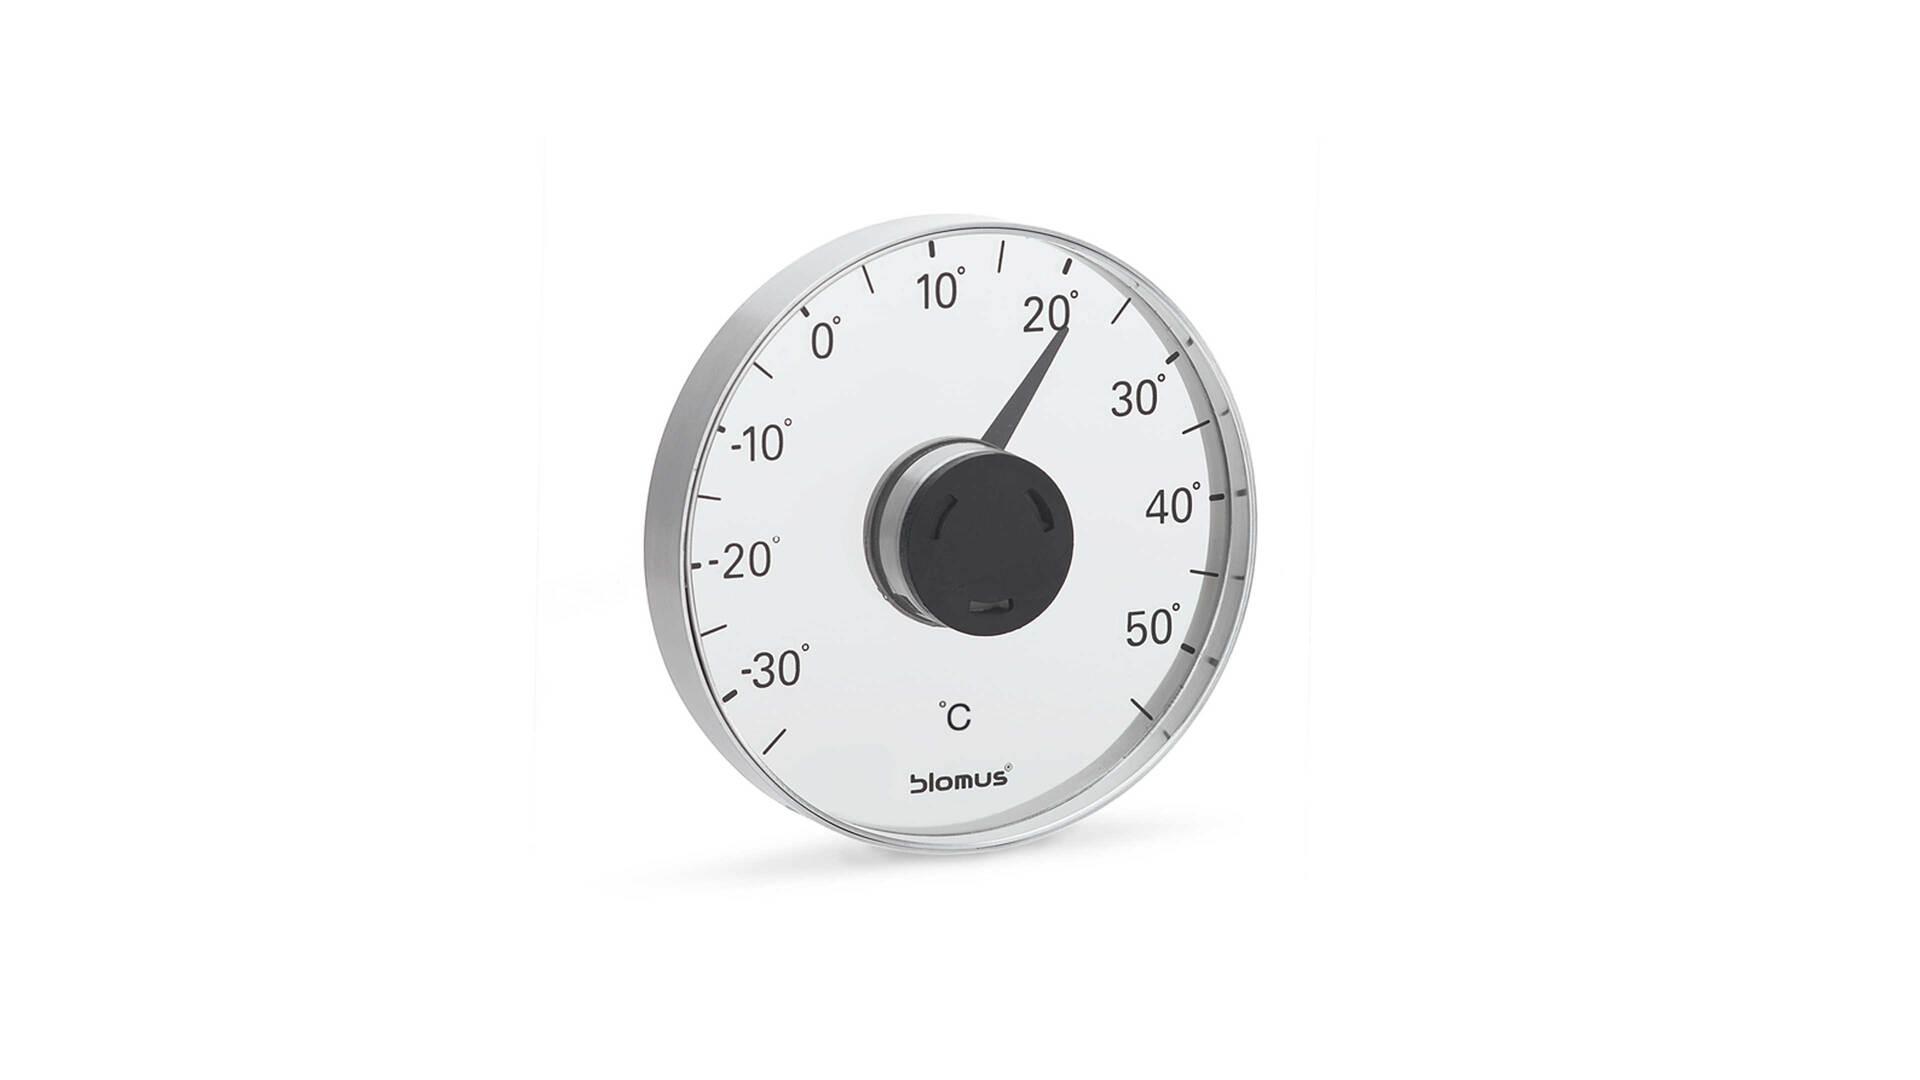 blomus Fenster-Thermometer Grado